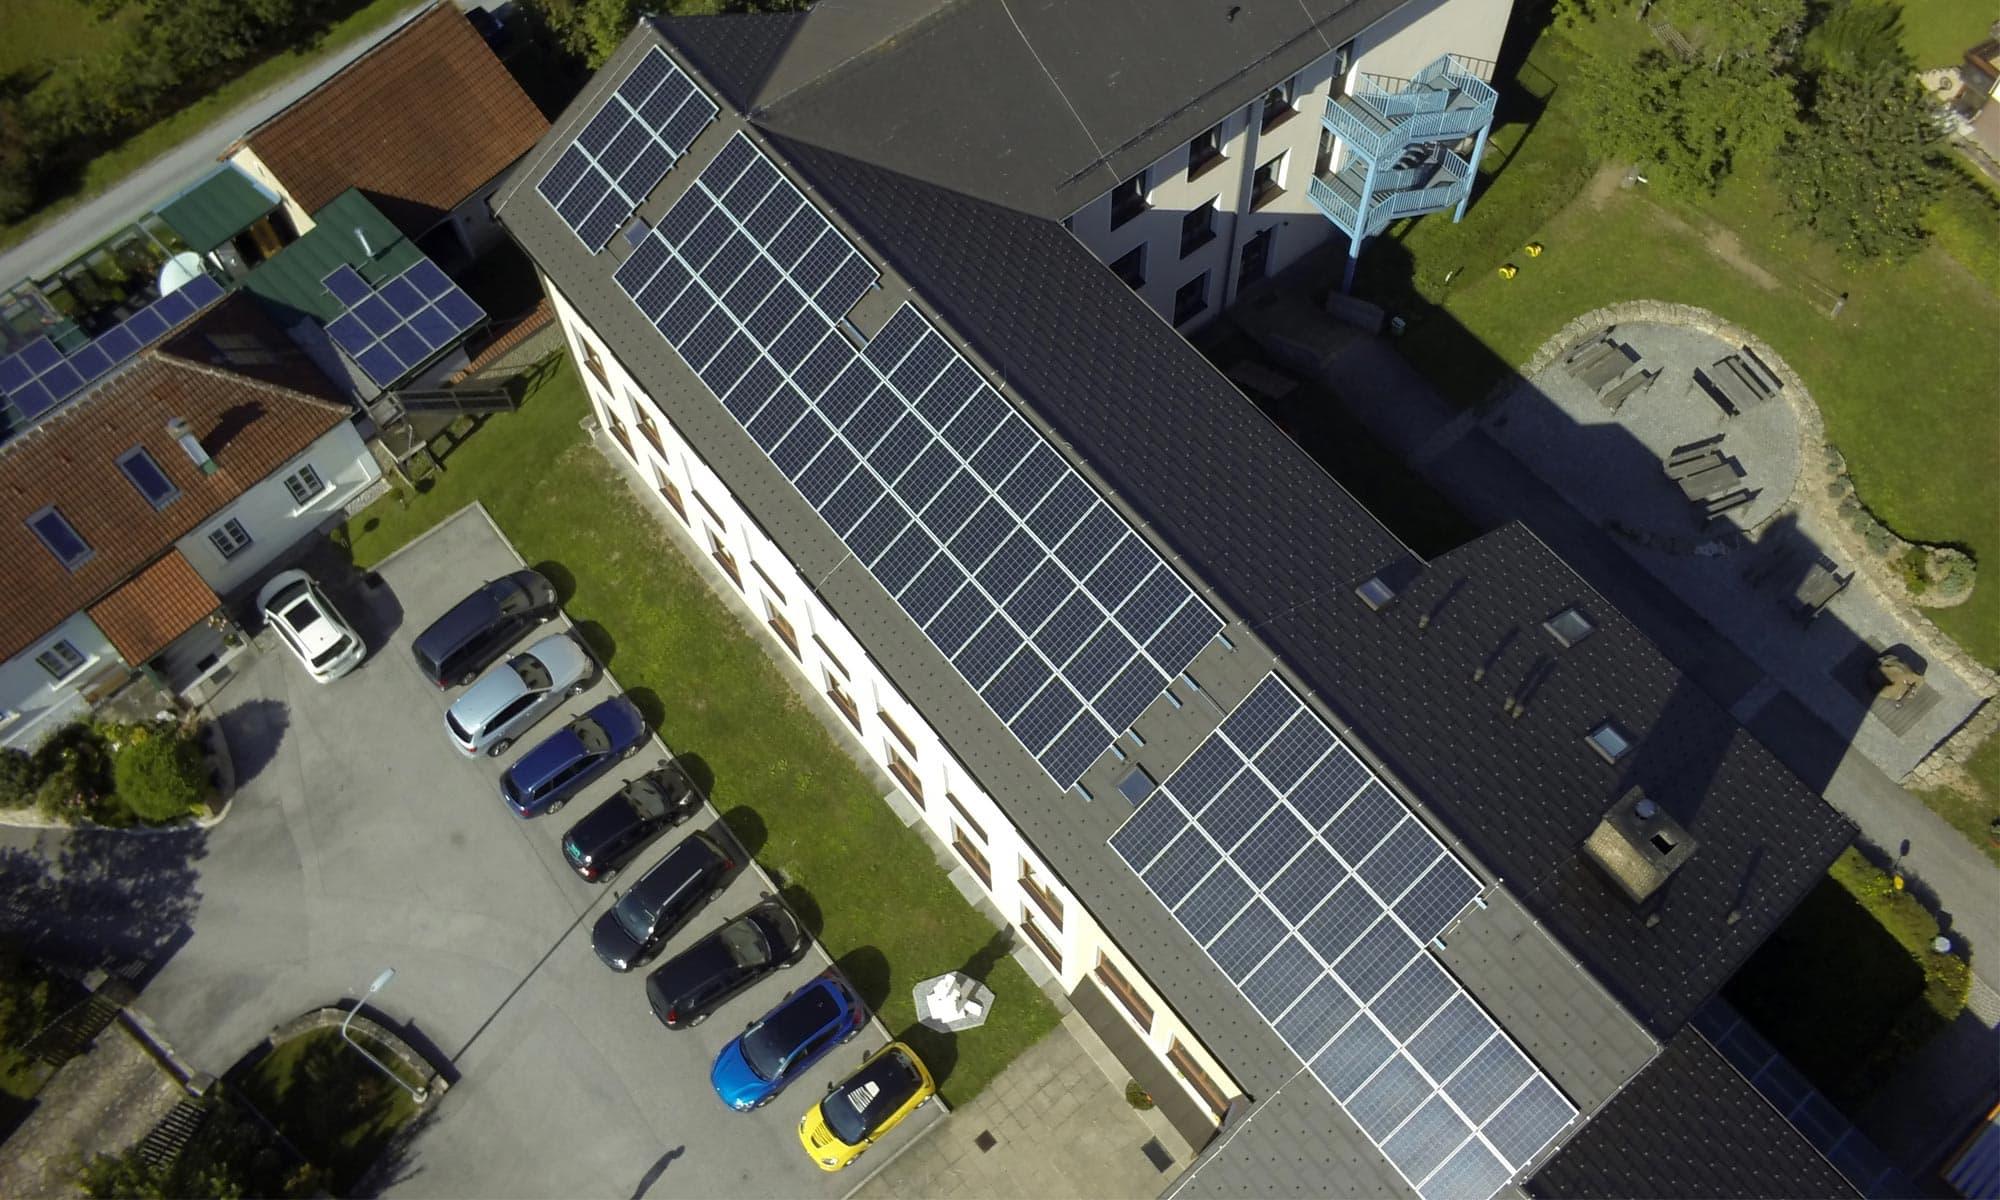 Umwelt & Energie: PV-Anlage Solarfox